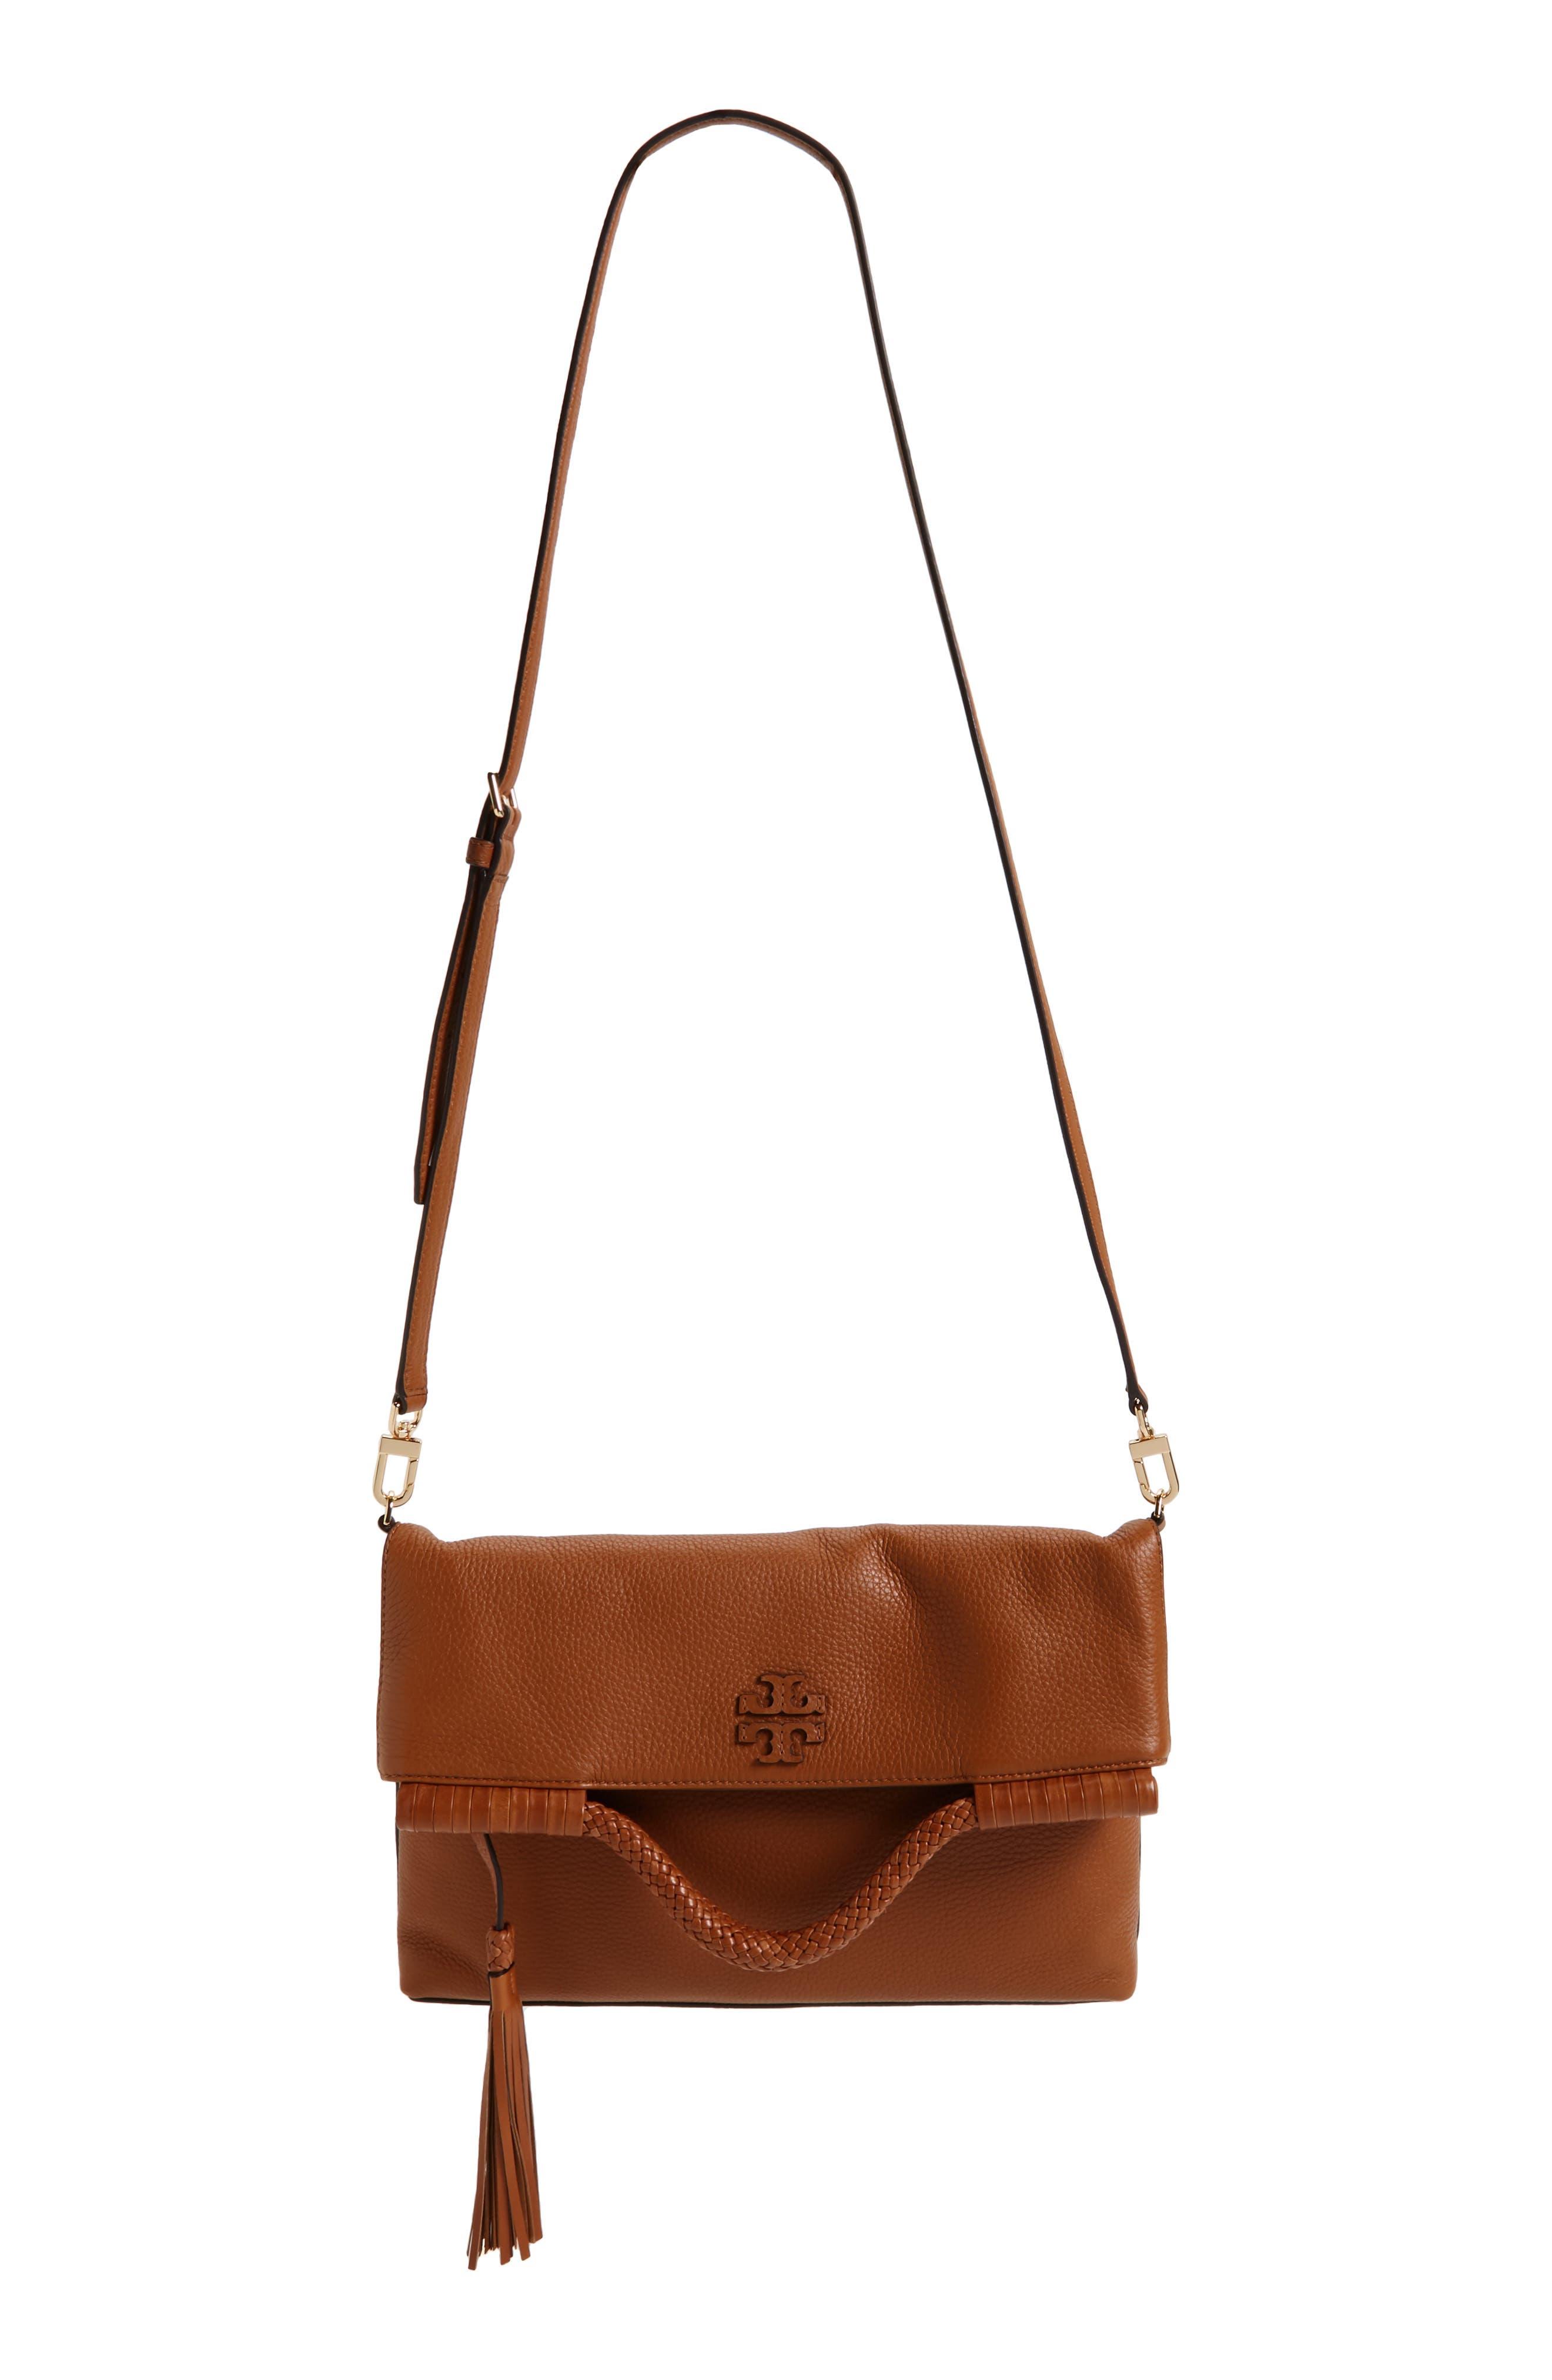 Convertible Leather Crossbody Bag,                             Main thumbnail 1, color,                             Saddle